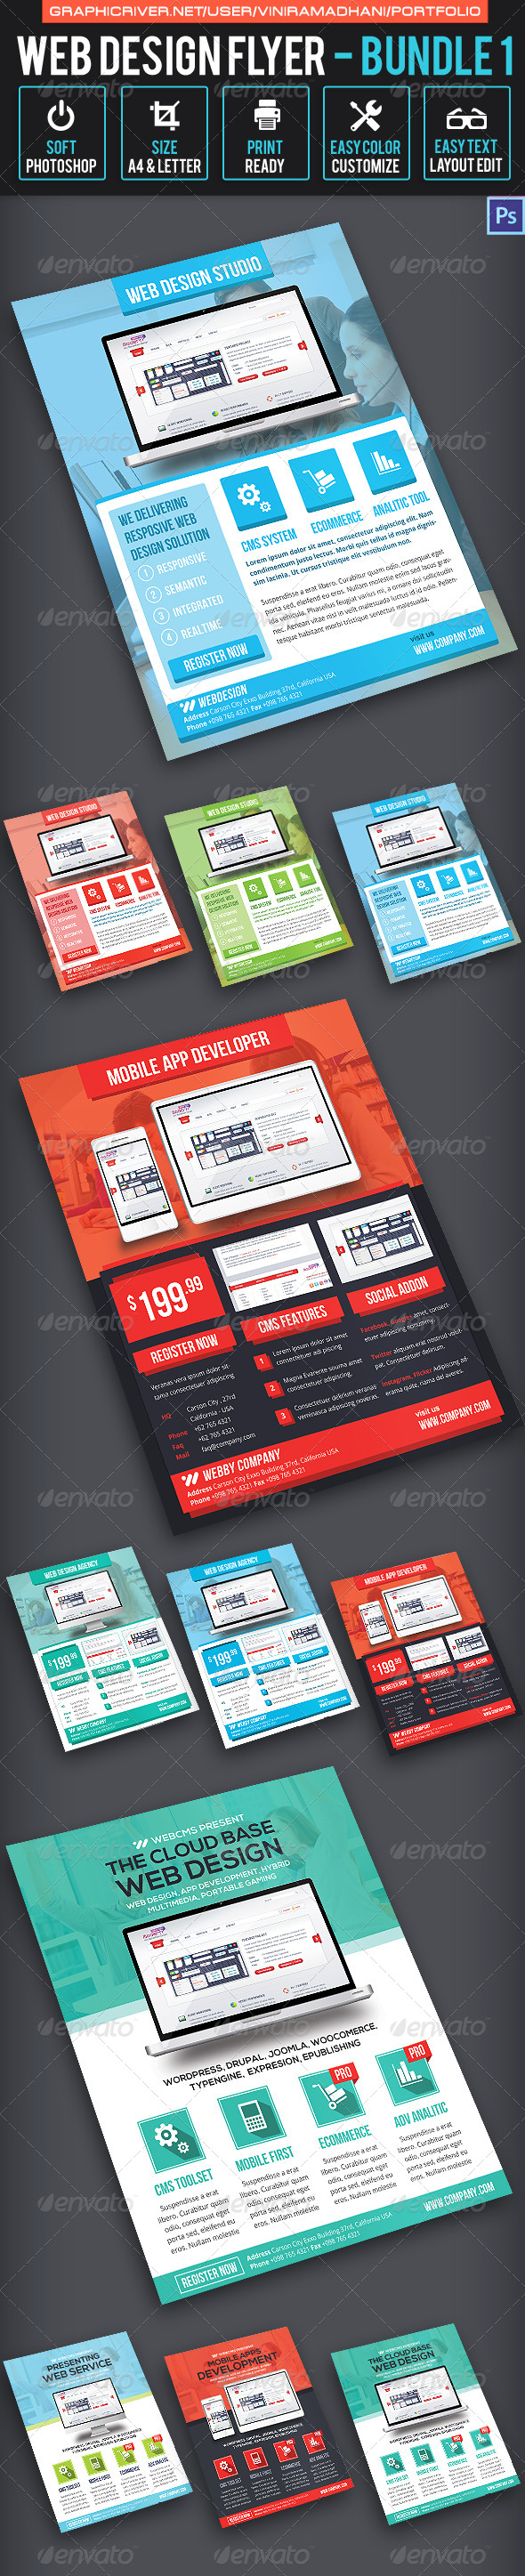 GraphicRiver Web Design Flyer Bundle 1 7325716